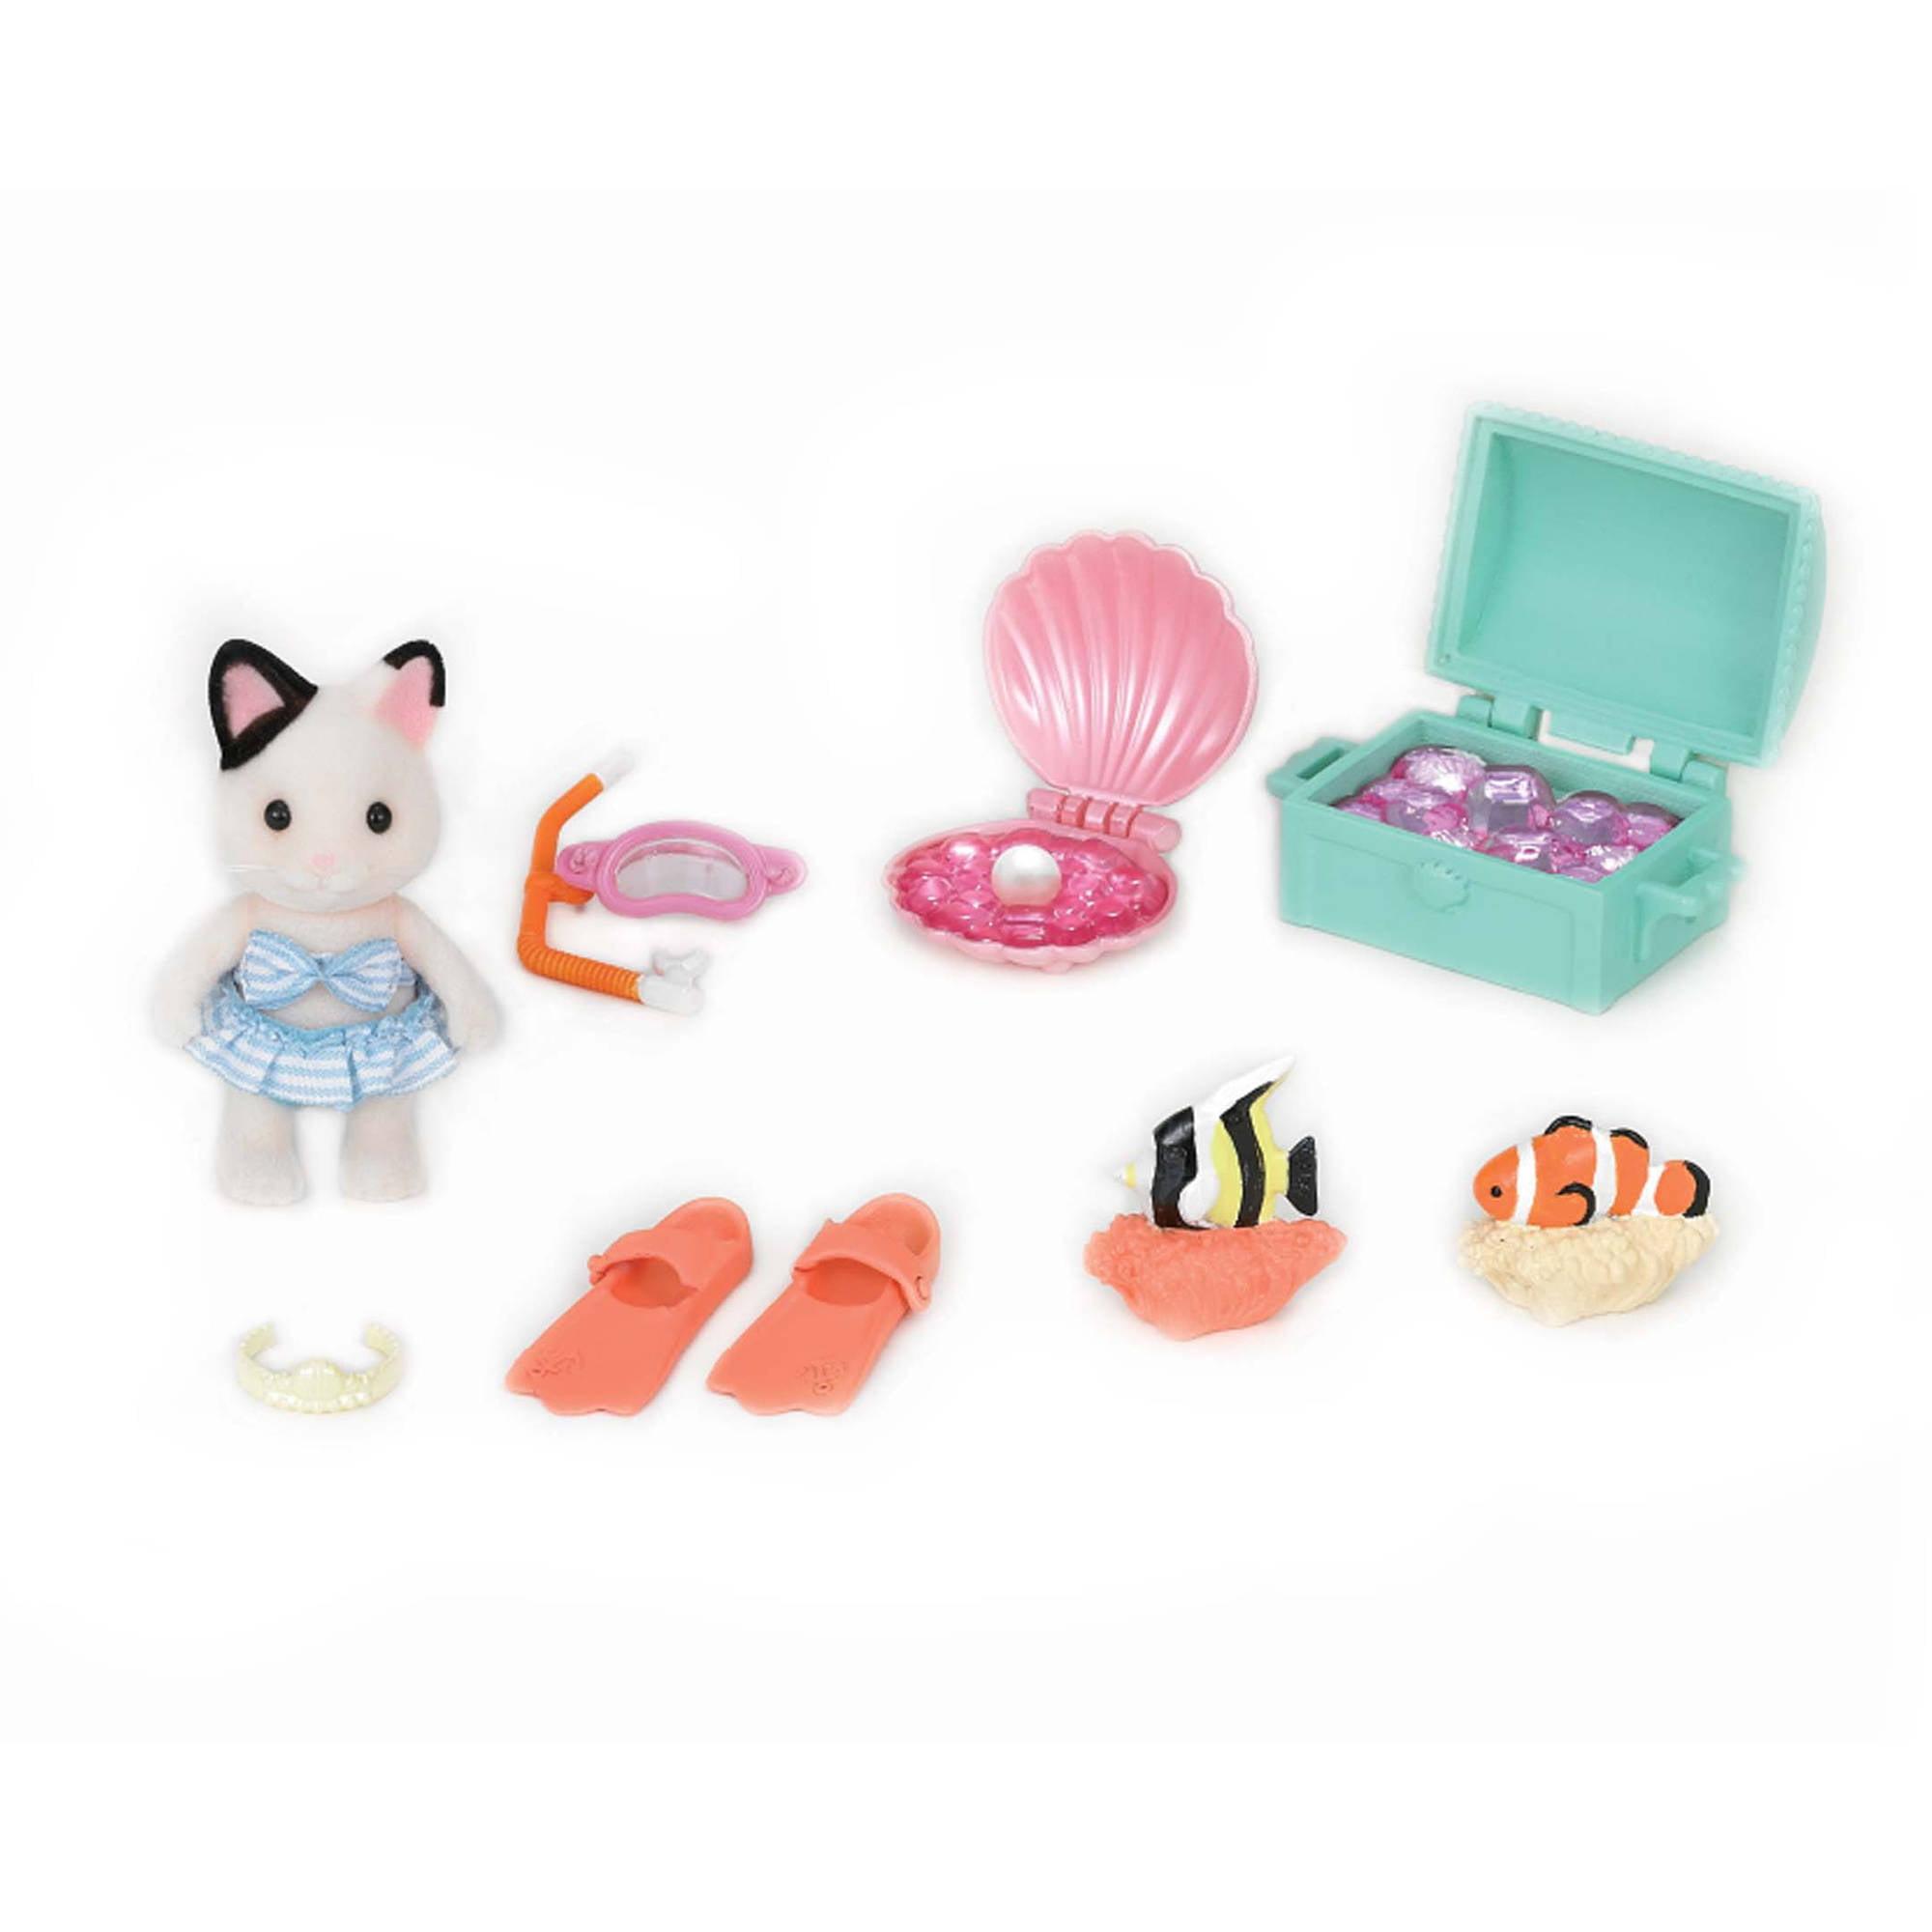 Calico Critters Seaside Treasure Set